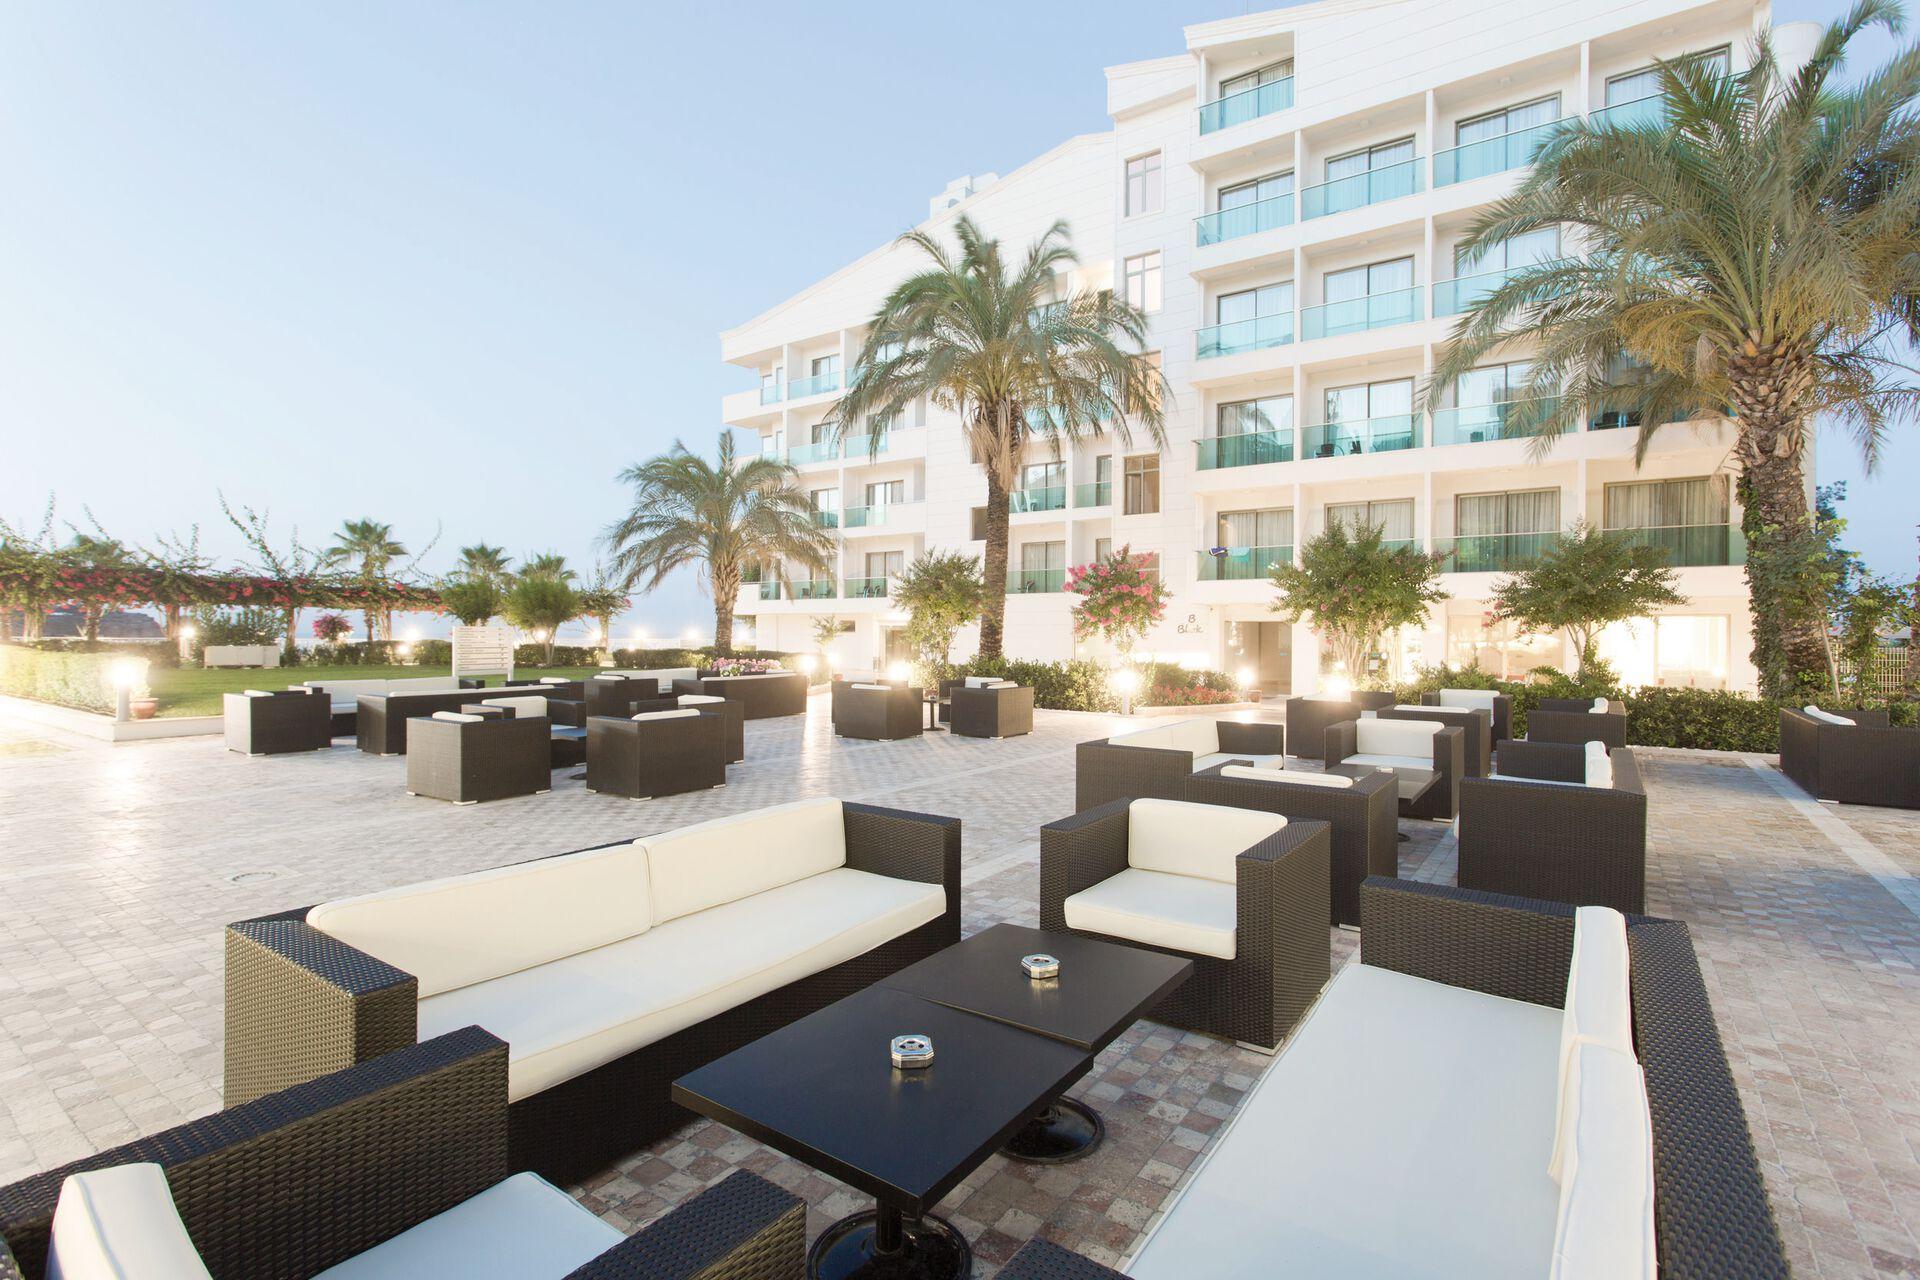 Turquie - Antalya - Club Hôtel Falcon 4*